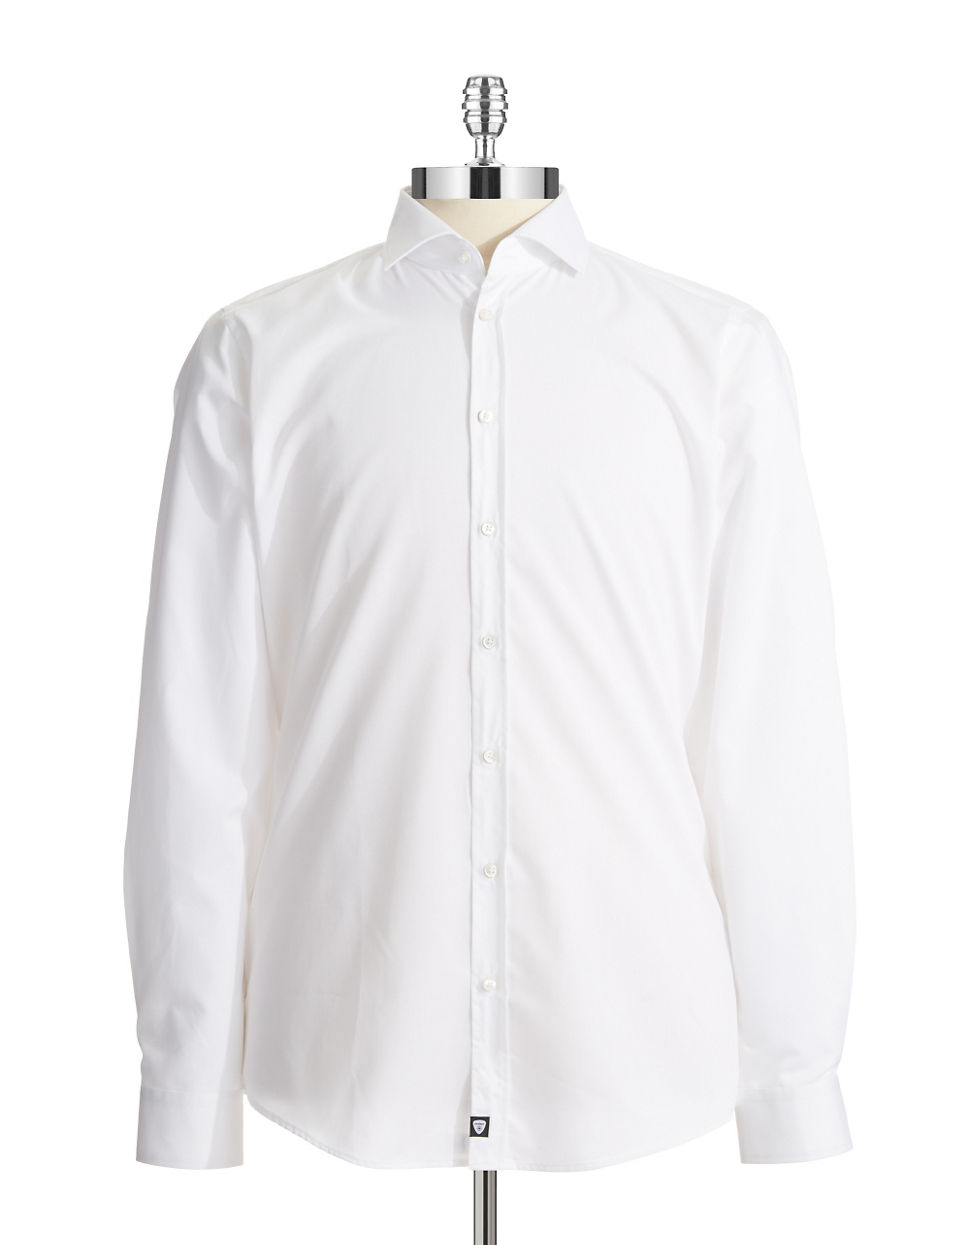 strellson jamie slim fit sportshirt in white for men lyst. Black Bedroom Furniture Sets. Home Design Ideas